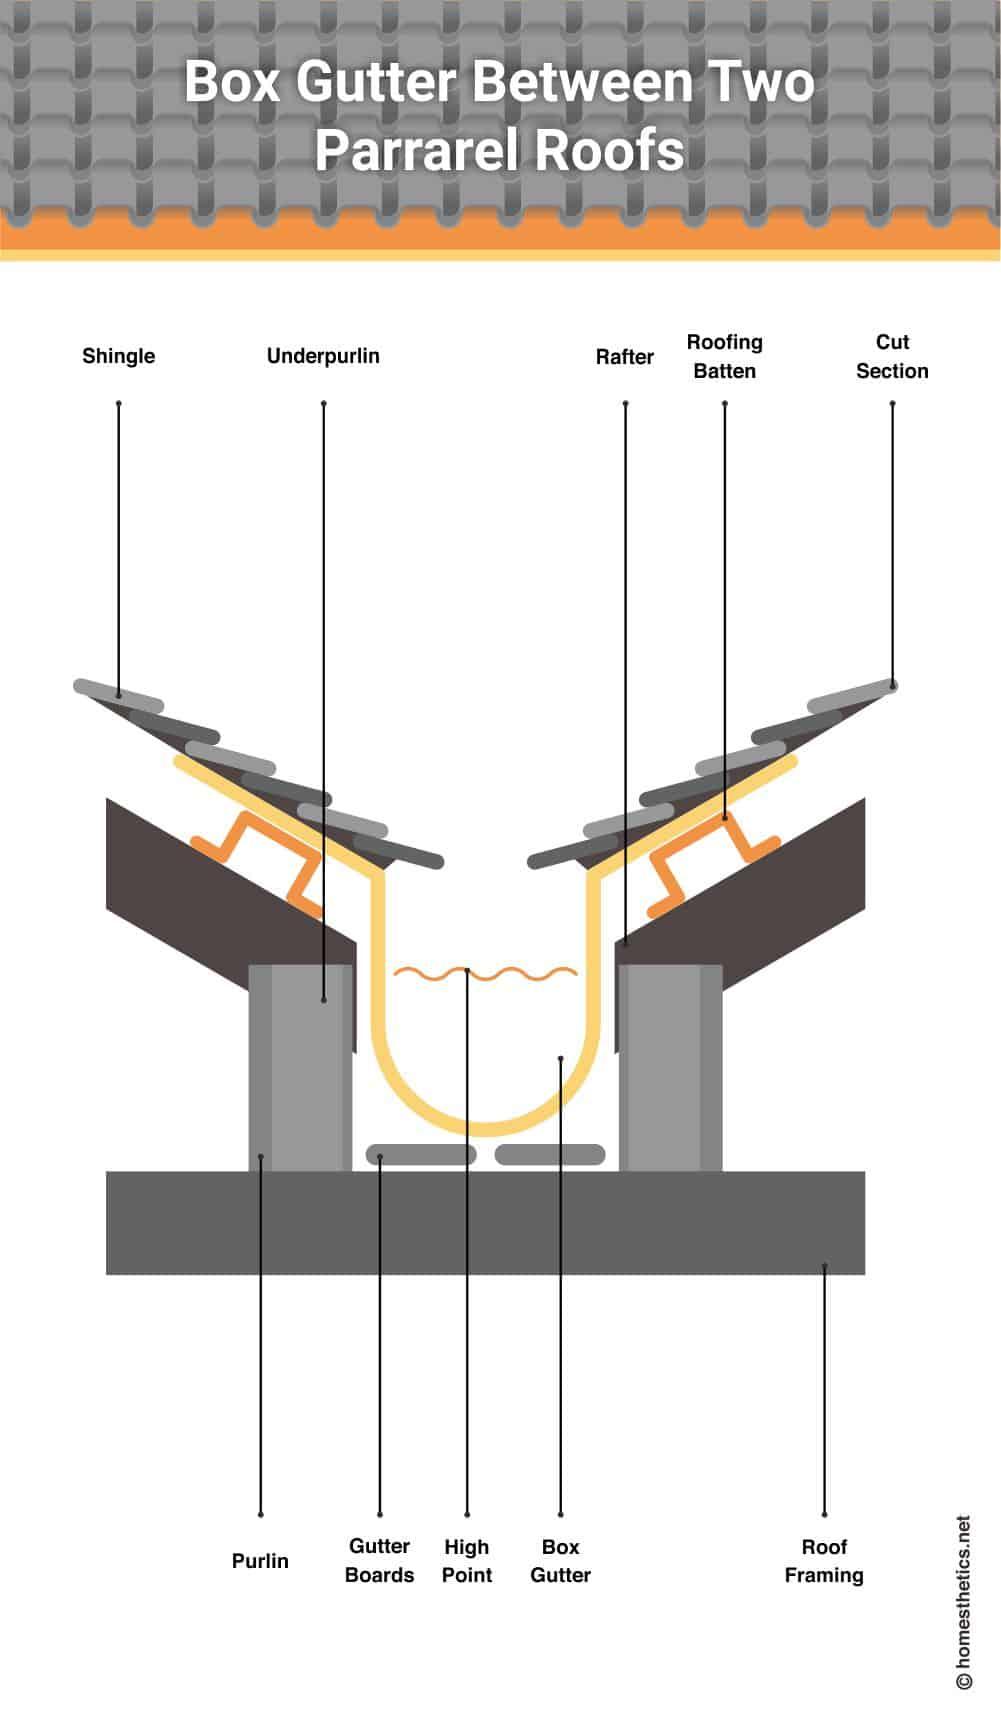 2 box gutter between two parrarel roofs